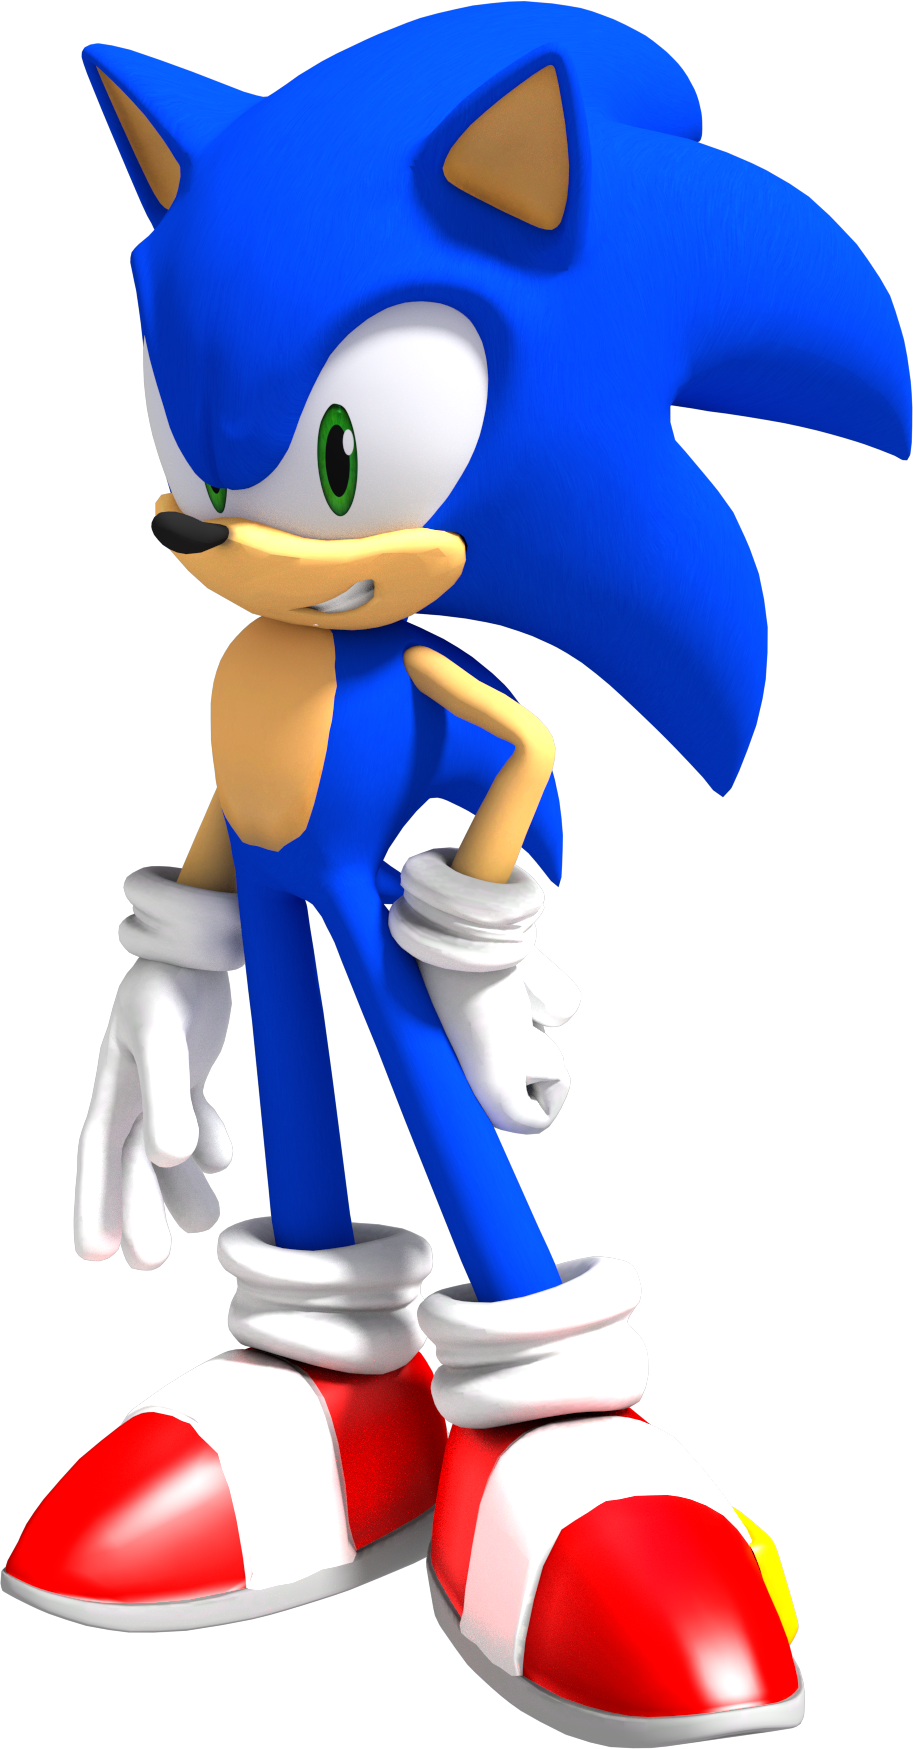 sonic the hedgehog digital - photo #16